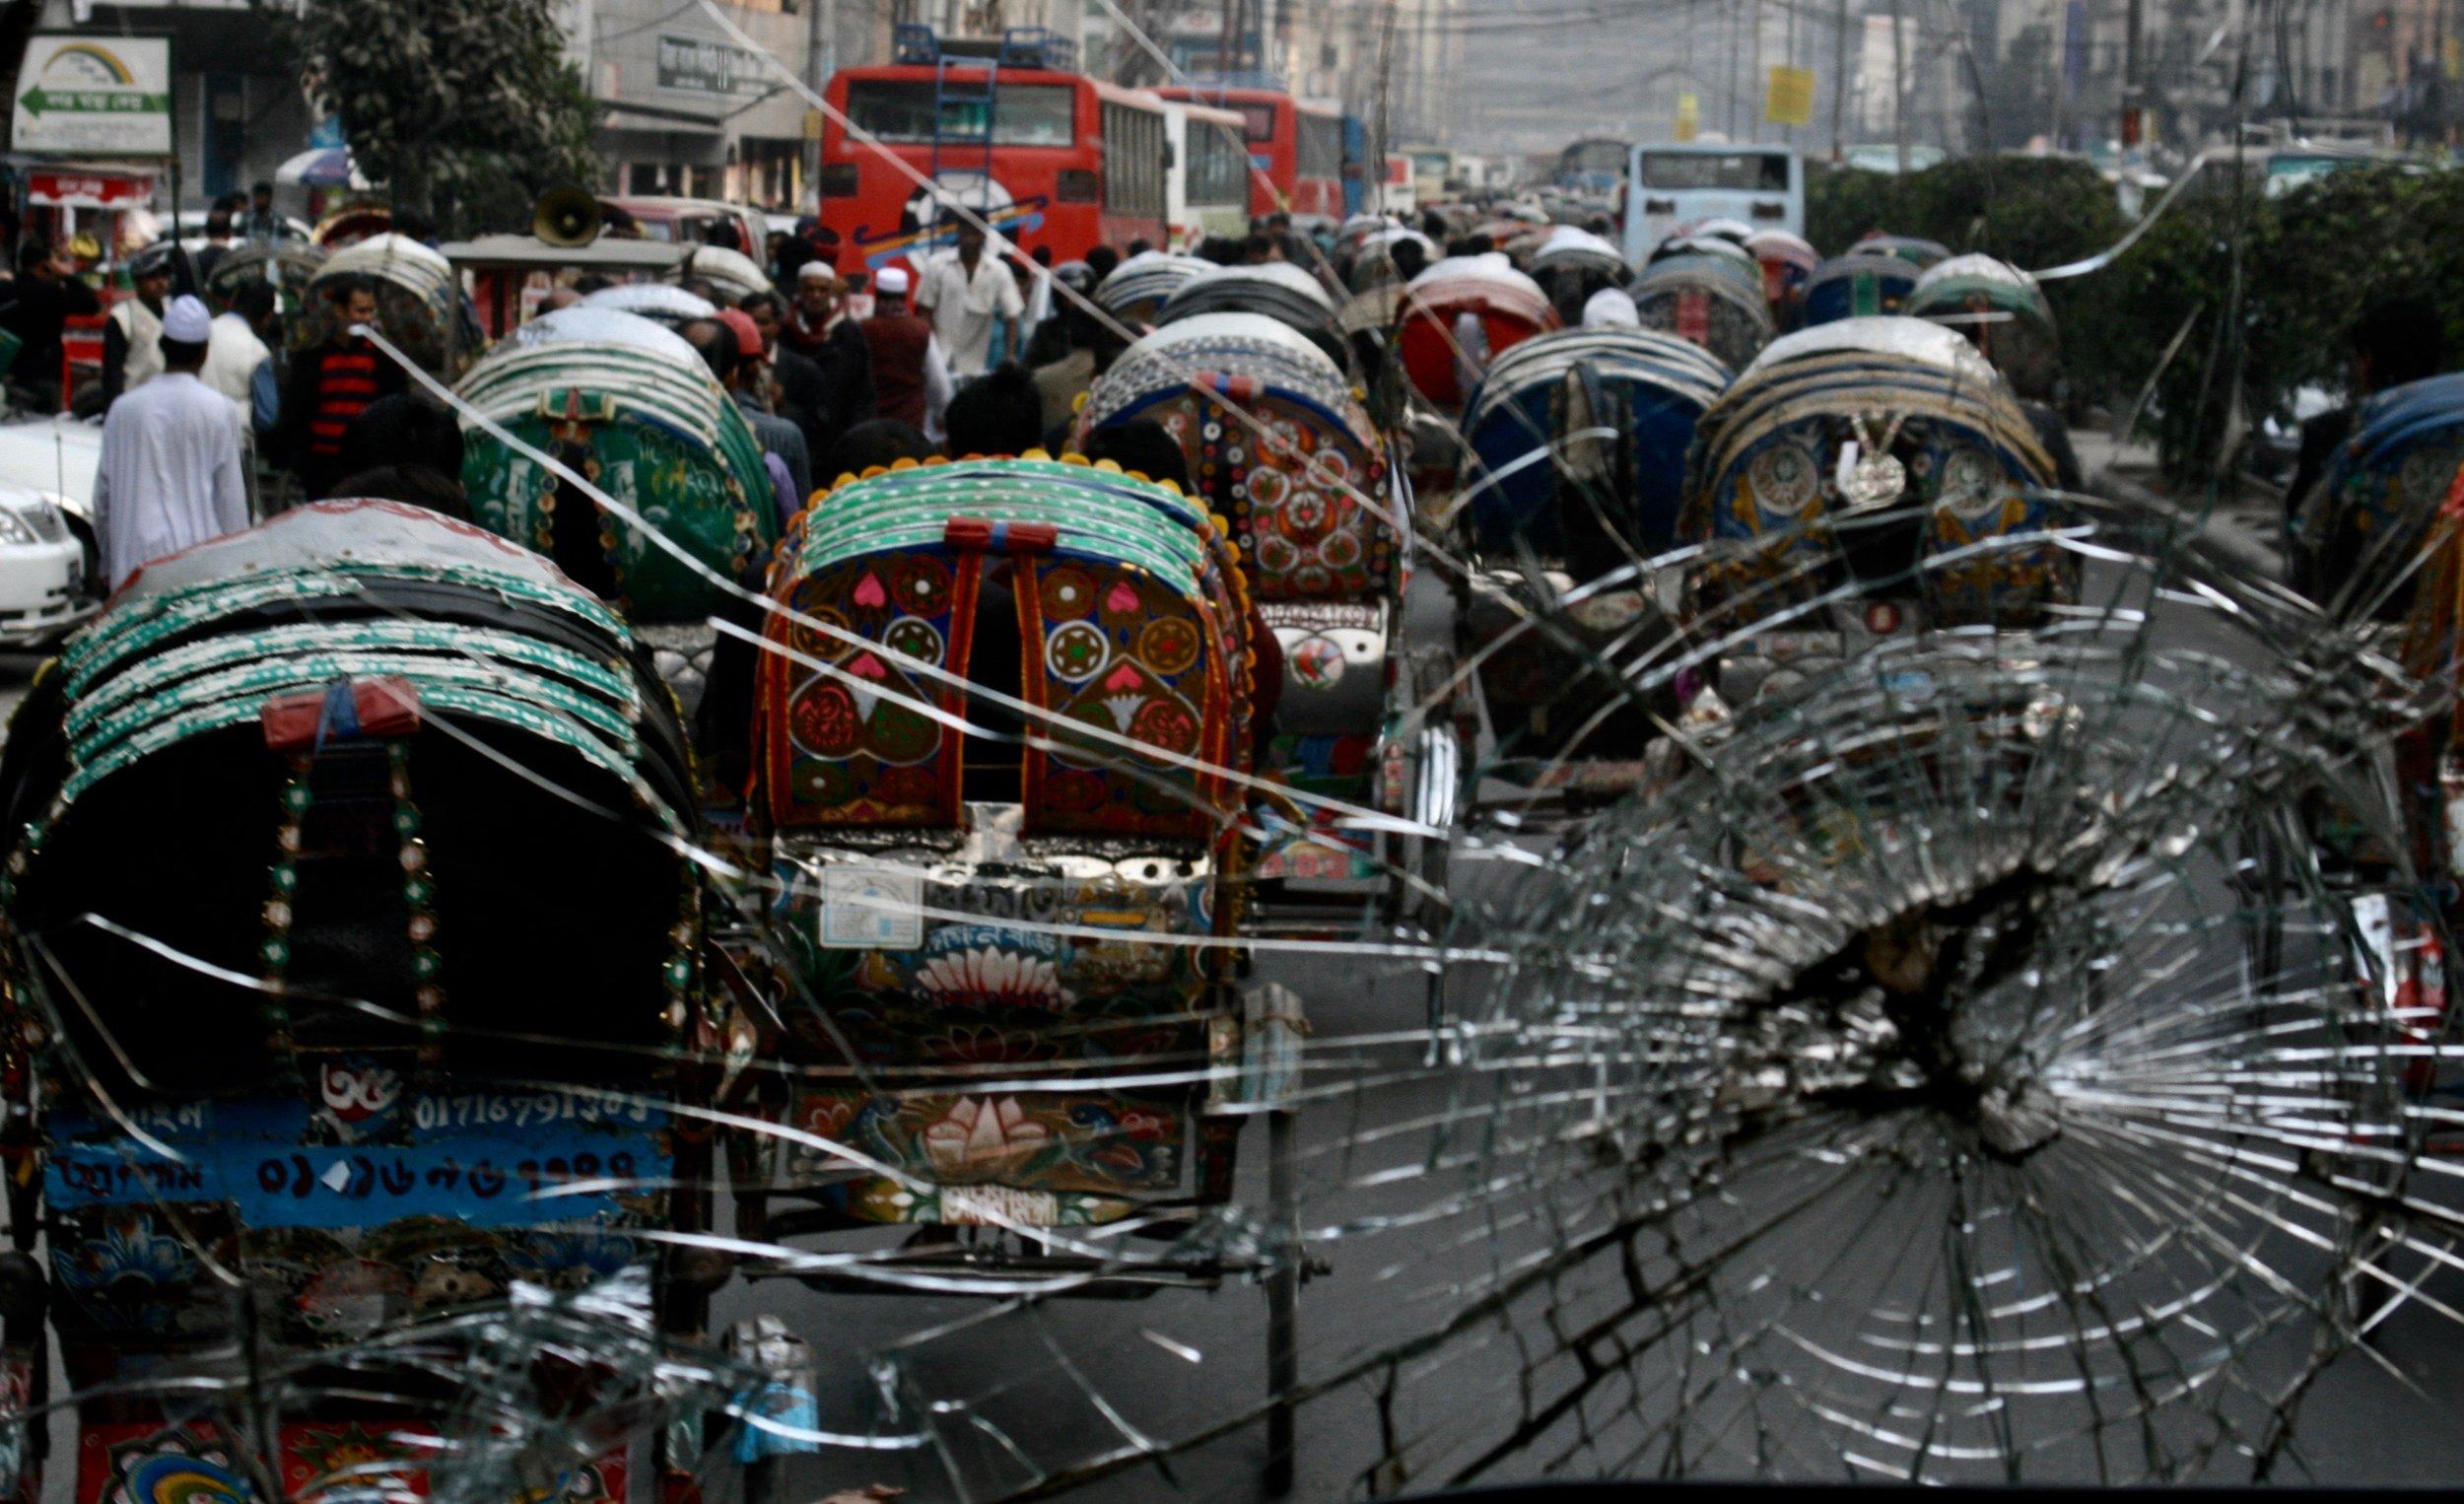 Places-Dhaka Street Scene.jpg